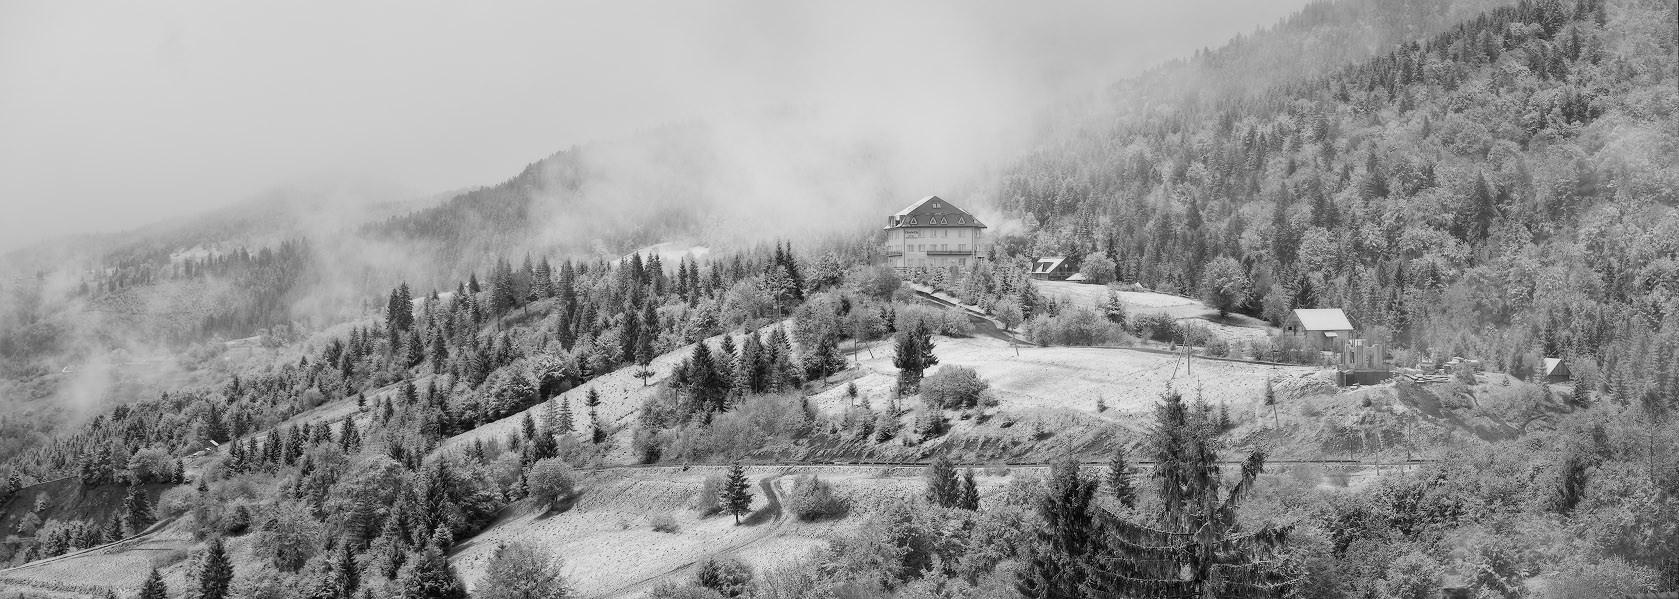 Снежный октябрь2